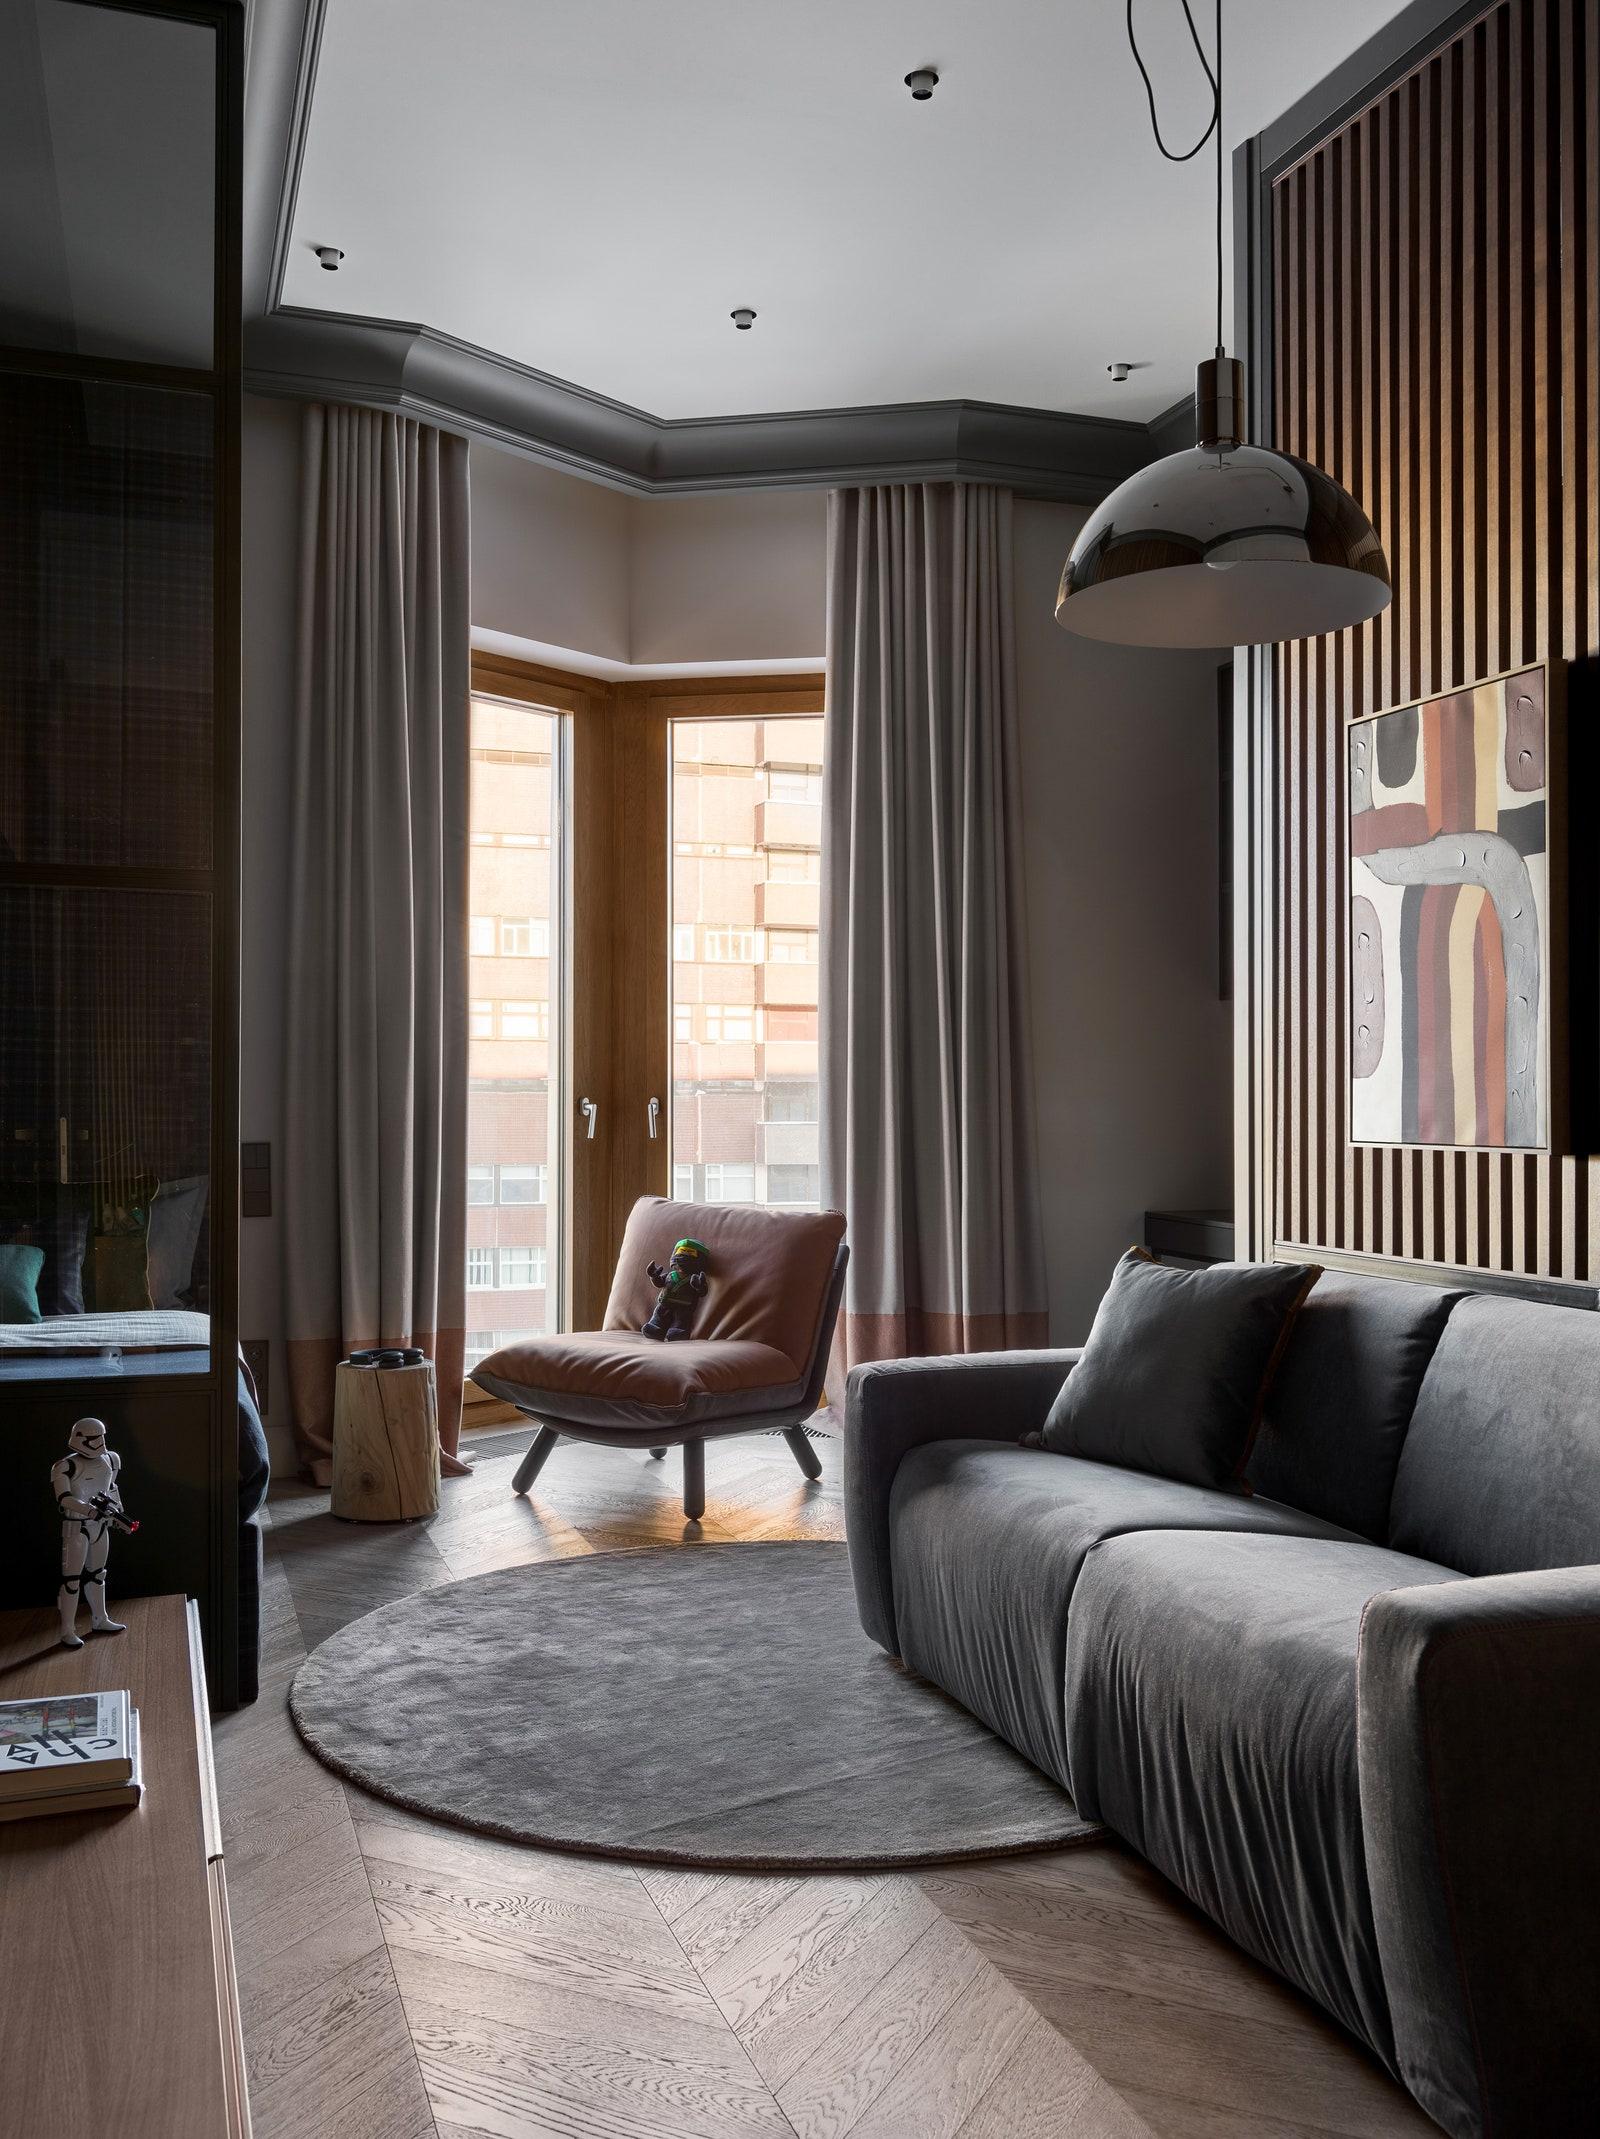 LL Brown  Tyson Felis    BoConcept   Legno Vivo           Nemo  Scanddyy  Barcelona Design  Enere  Moonstores  Barcelona...